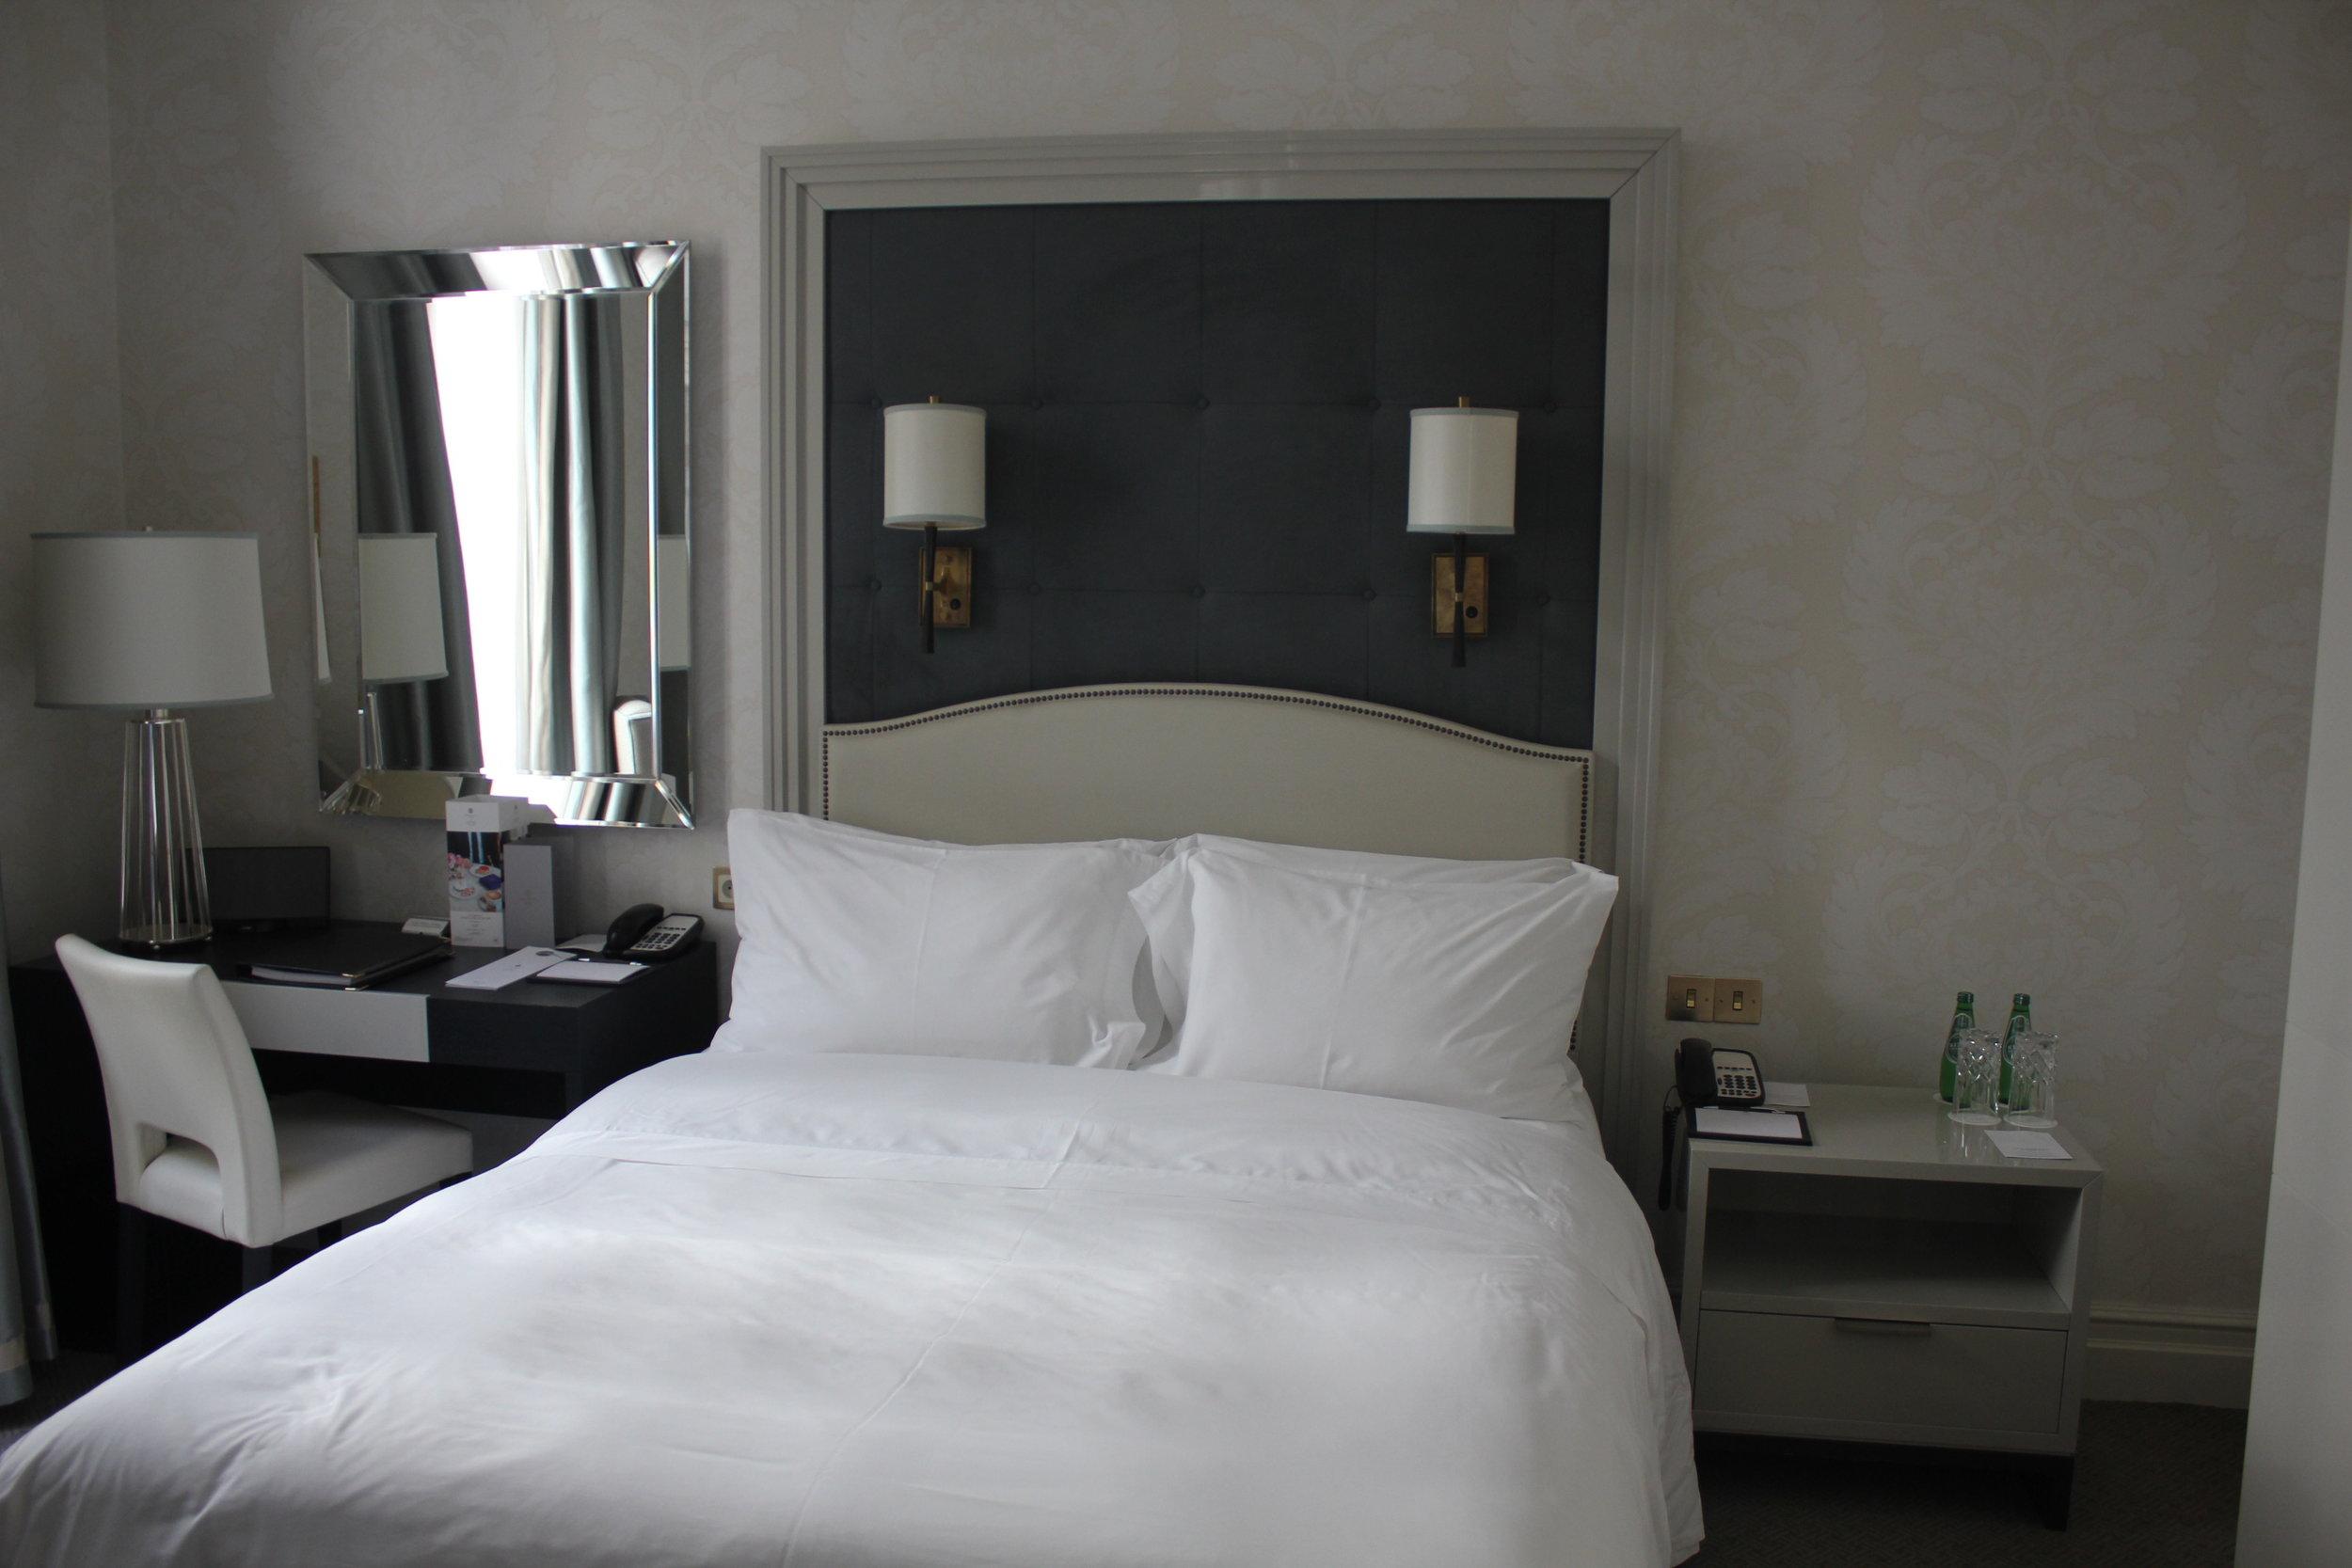 Hotel Bristol Warsaw – Bedroom